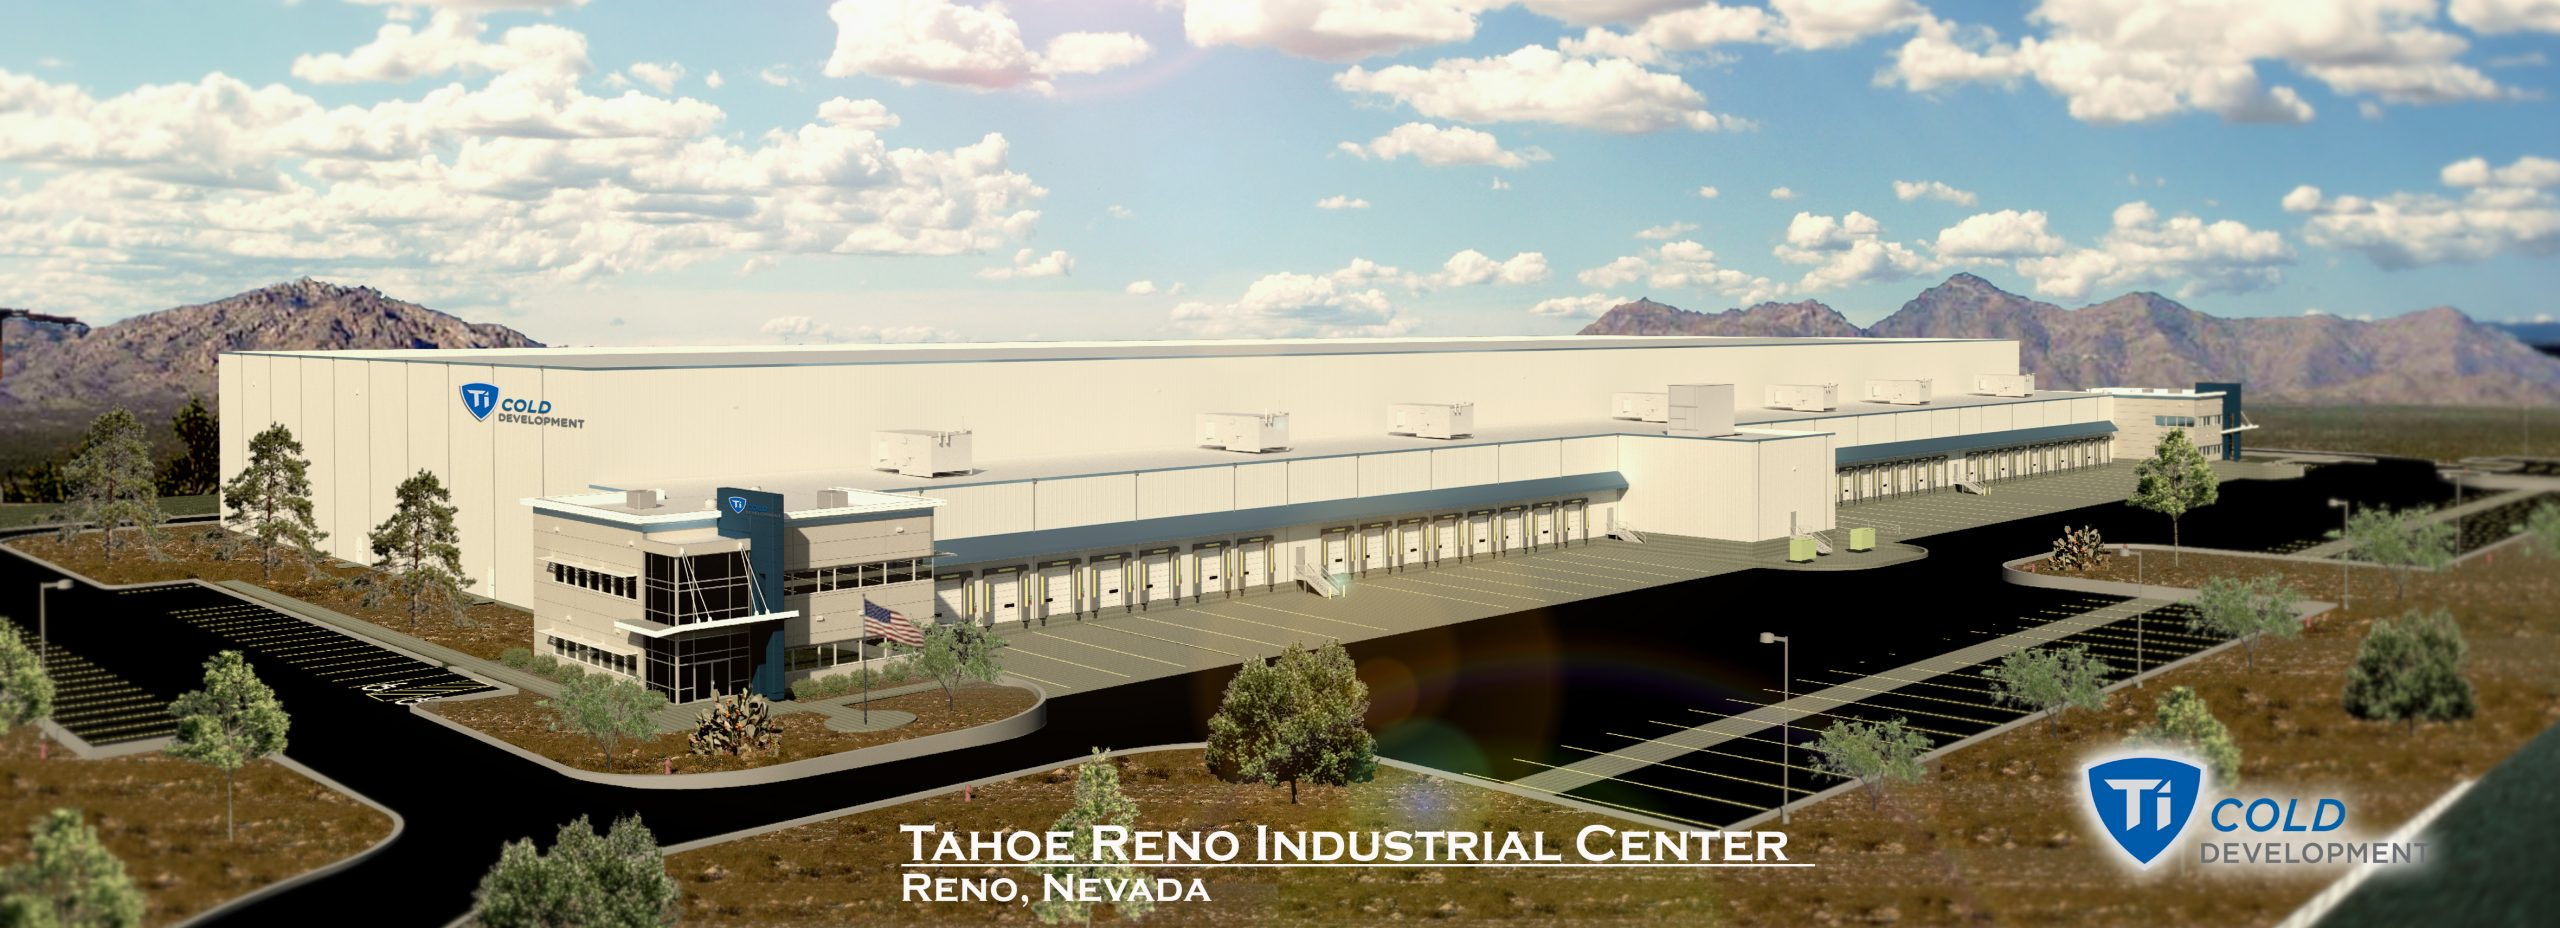 Ti Cold Development Building Rendering - Tahoe Reno Industrial Center Nevada